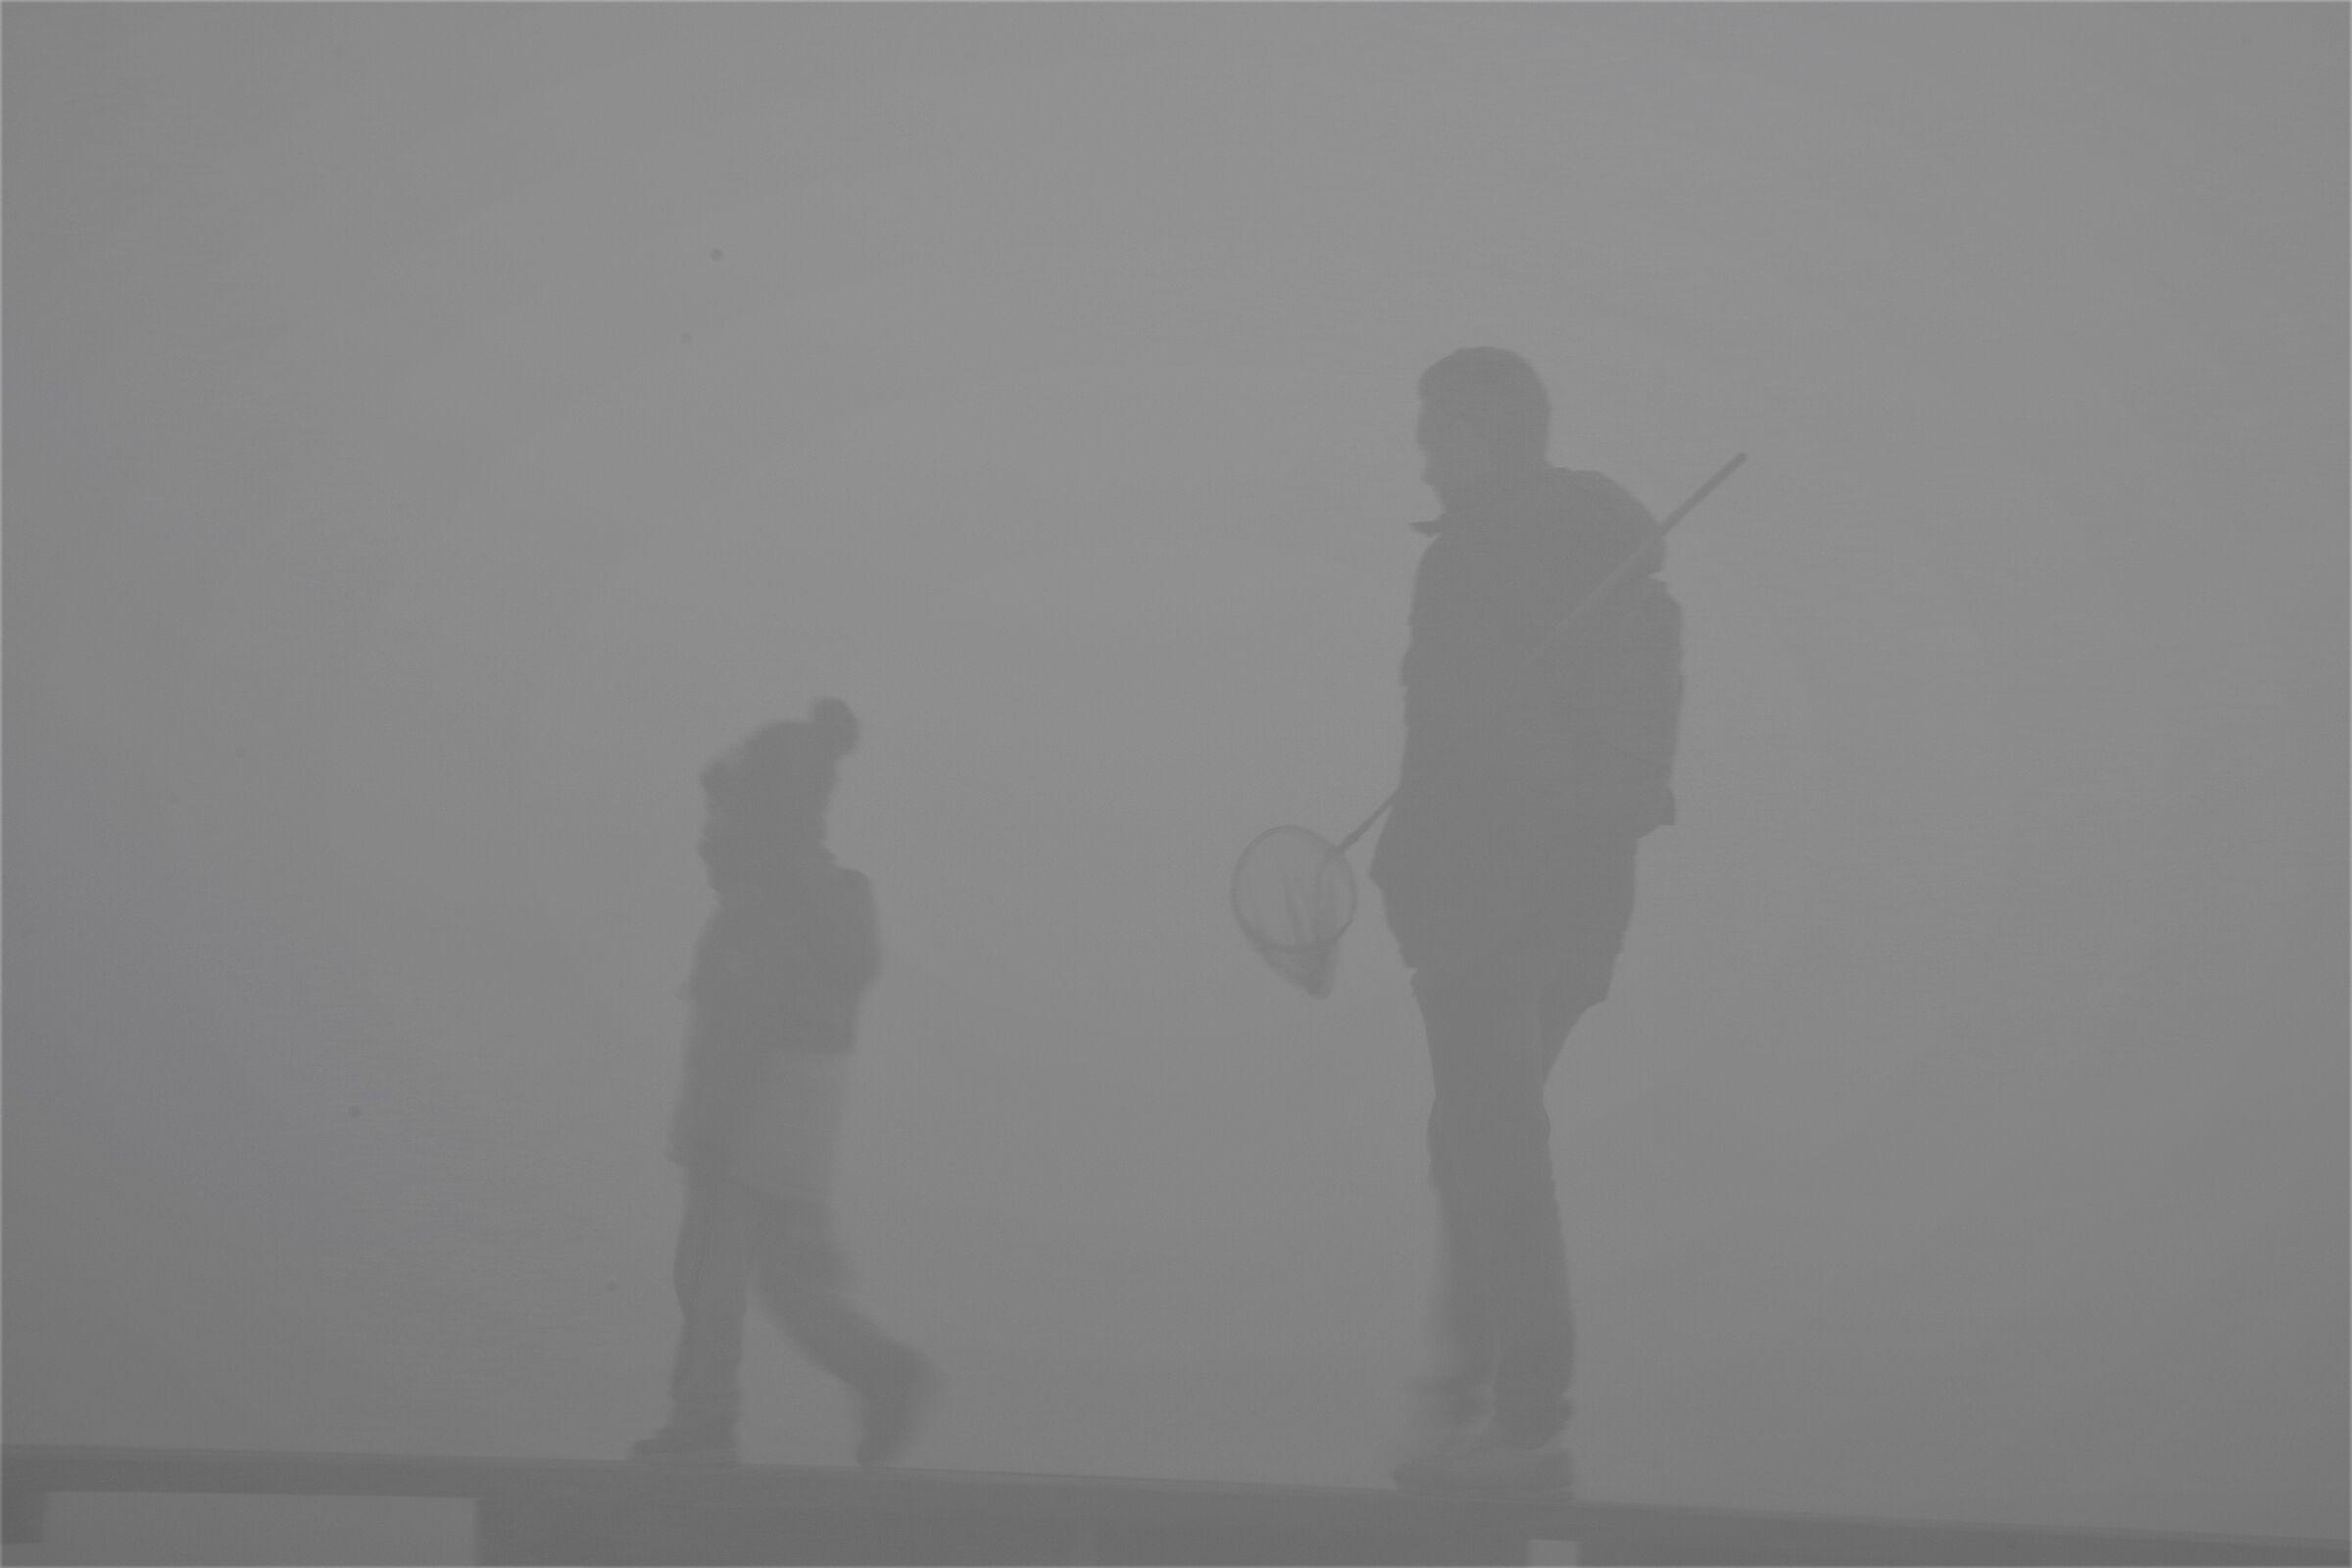 Fishing in the fog...